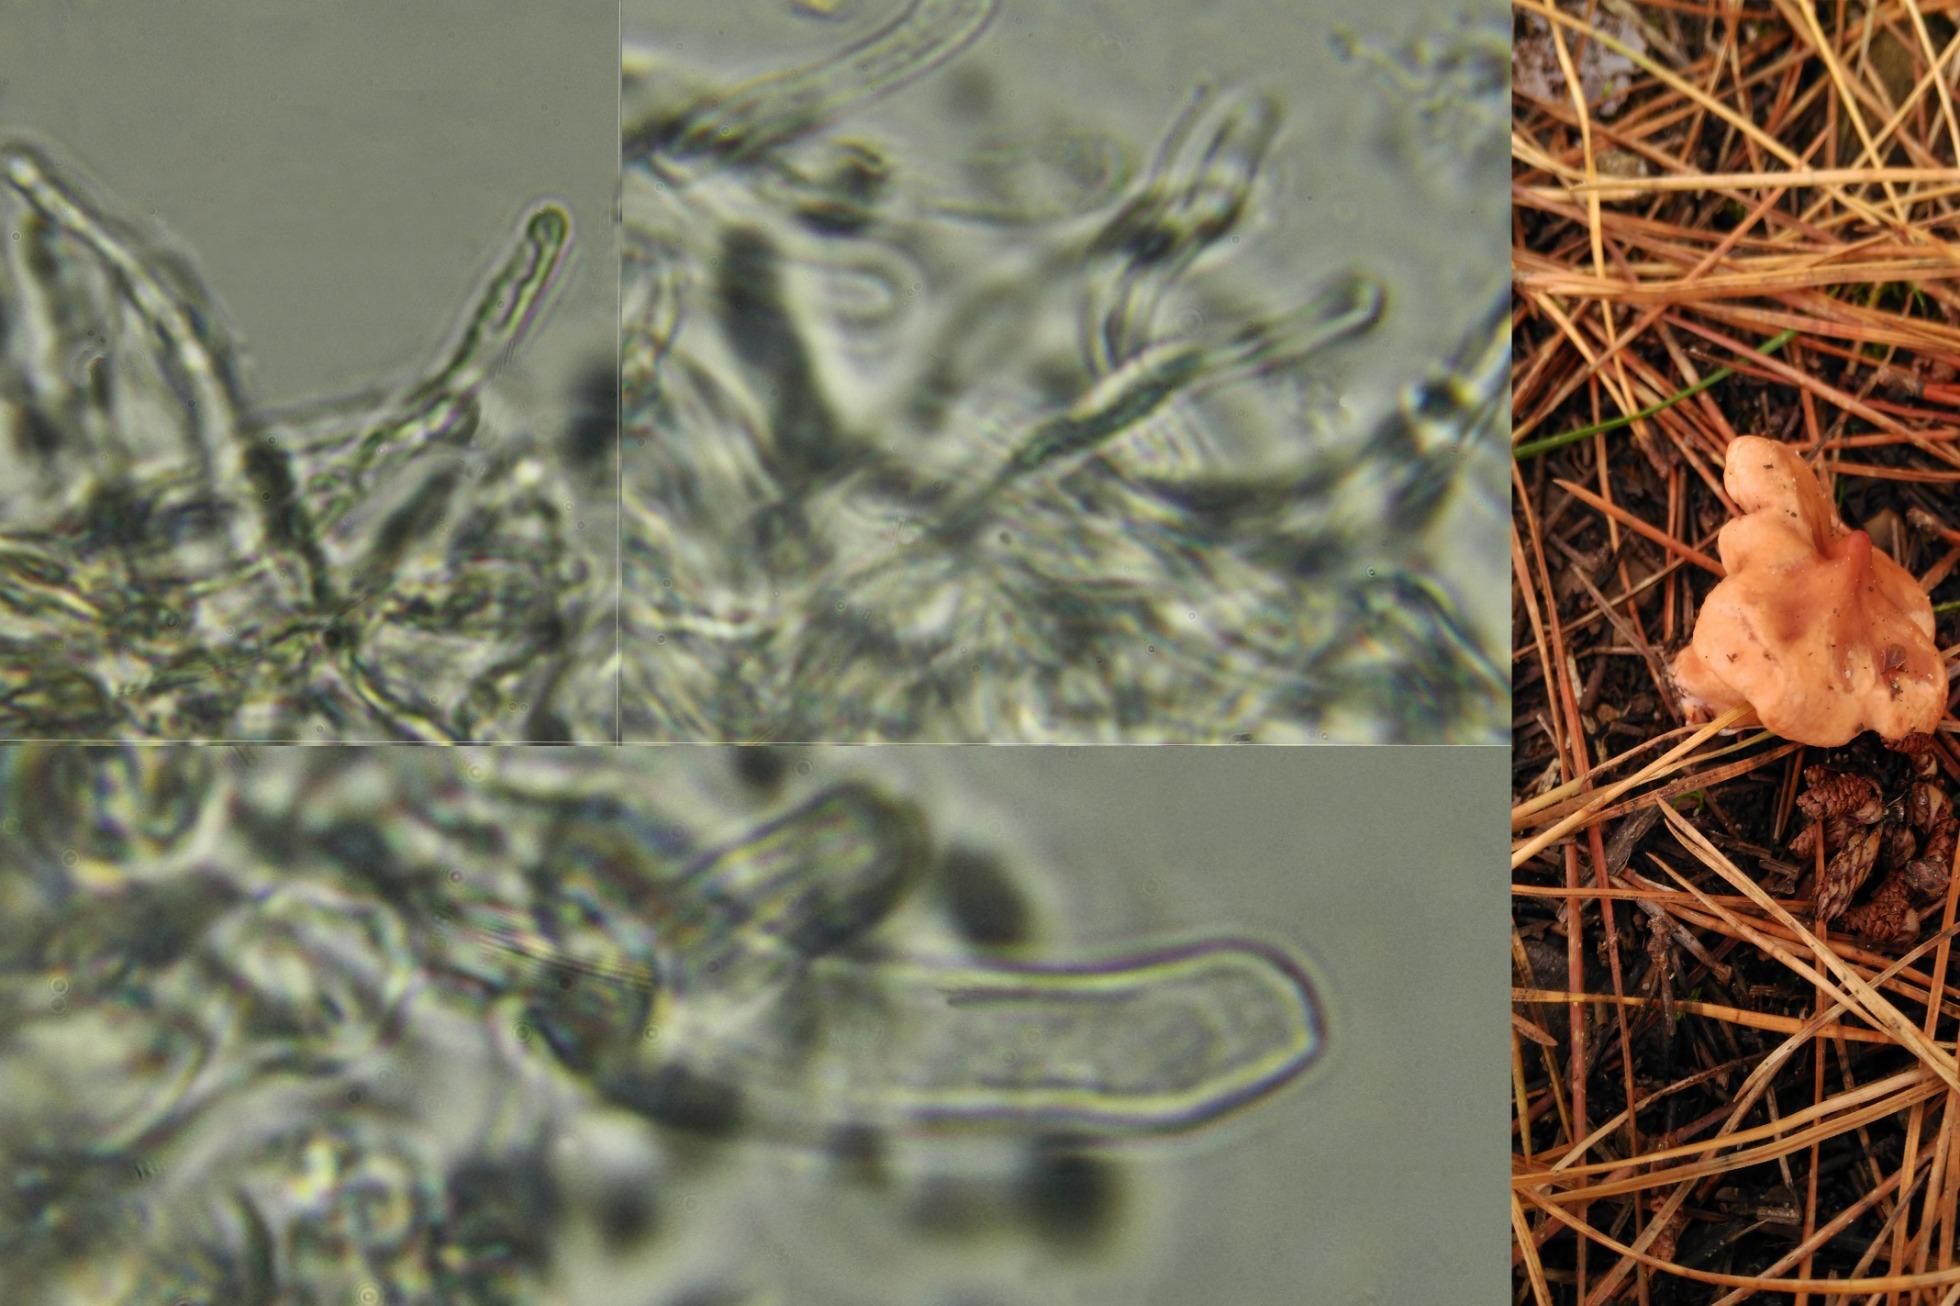 pileocistidios_2018-12-05.jpg